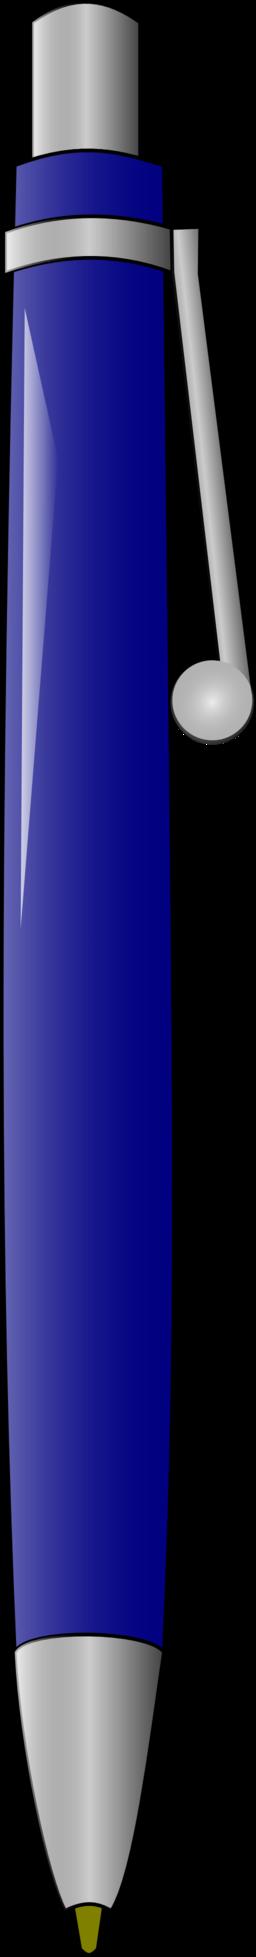 Pen Clipart Png.